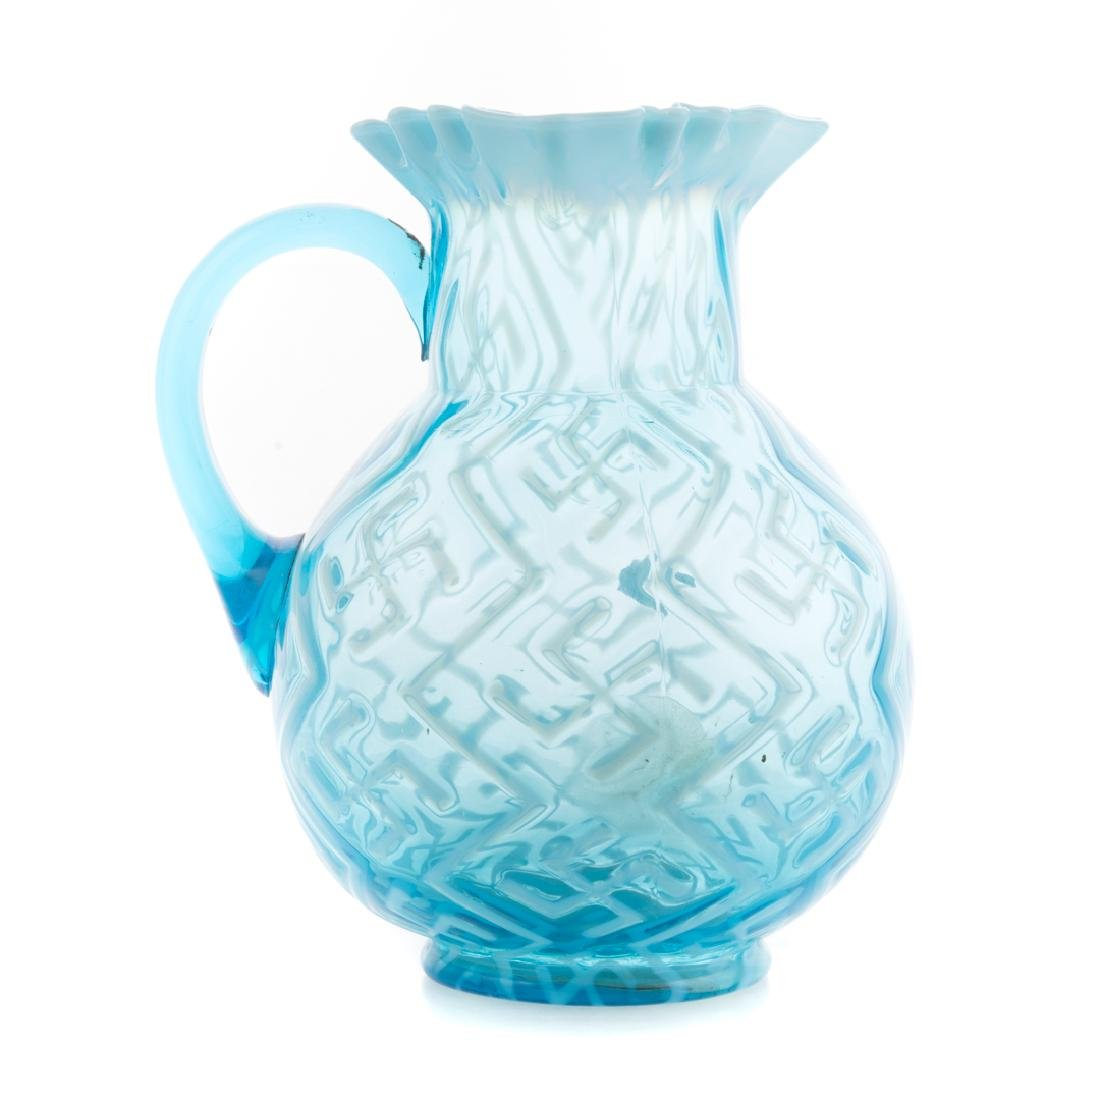 Dugan opalescent blue glass swastika pitcher